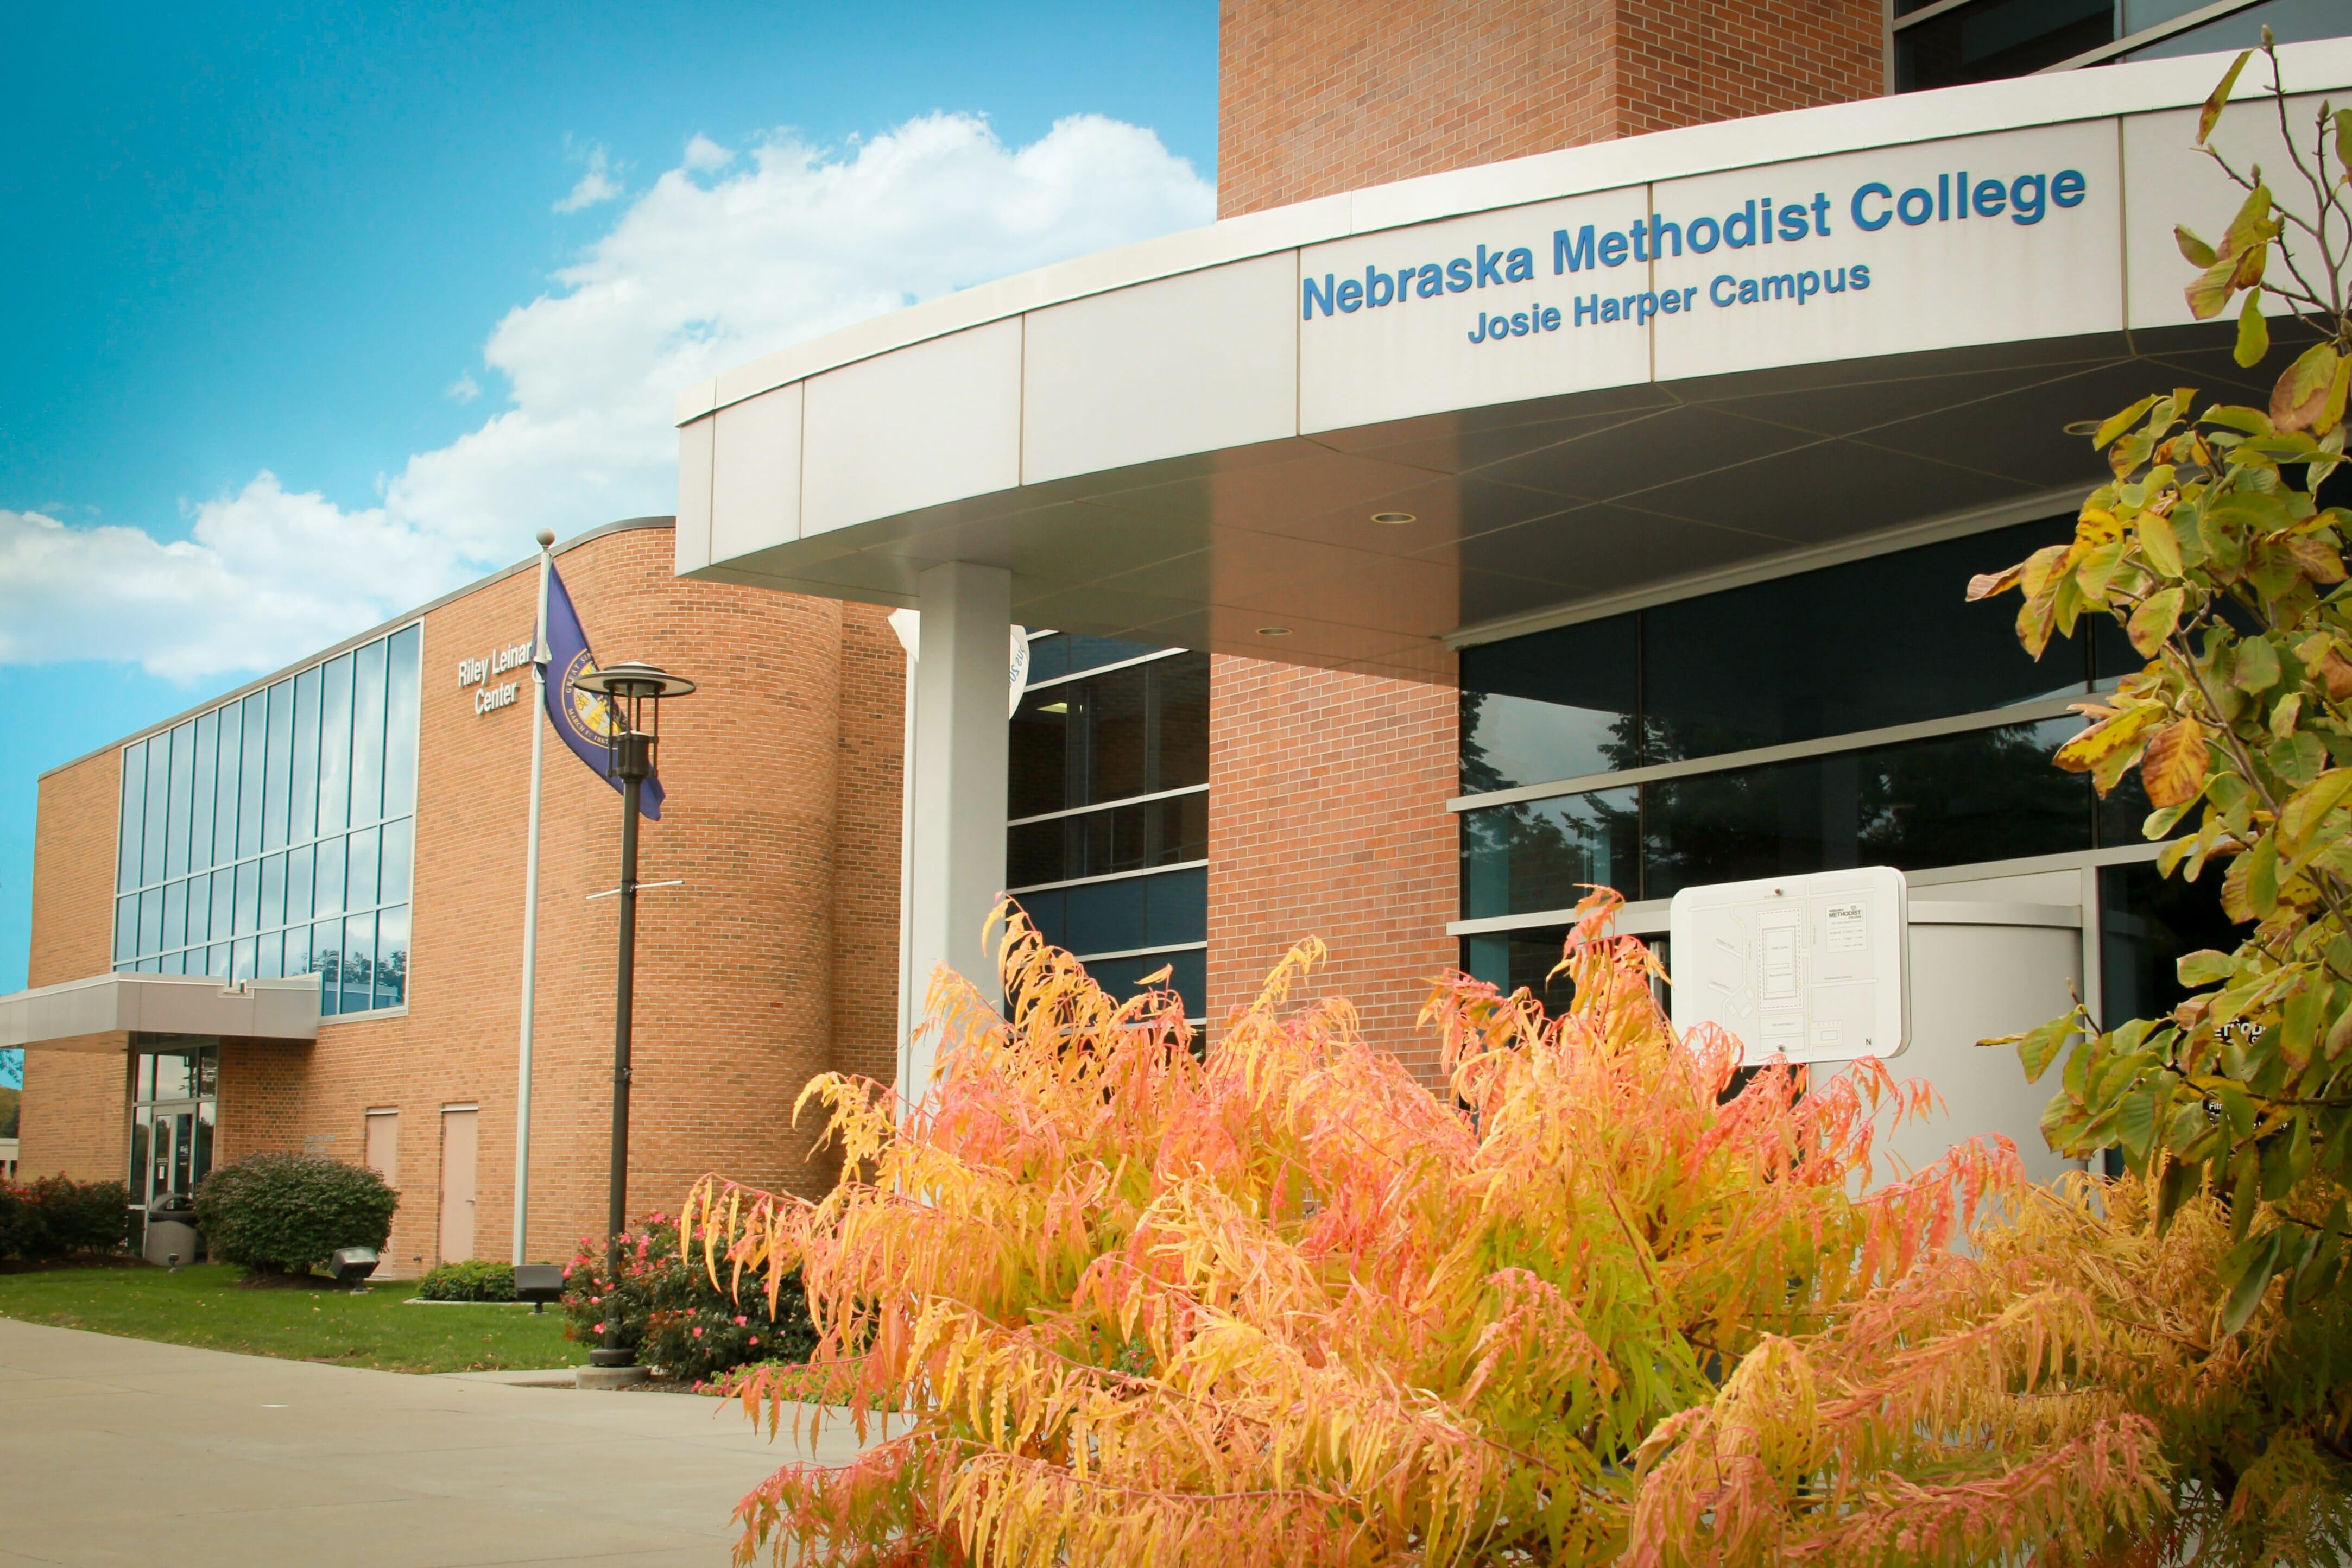 Nebraska Methodist College - Top 25 Most Affordable Accelerated Master's in Nursing Online for 2018